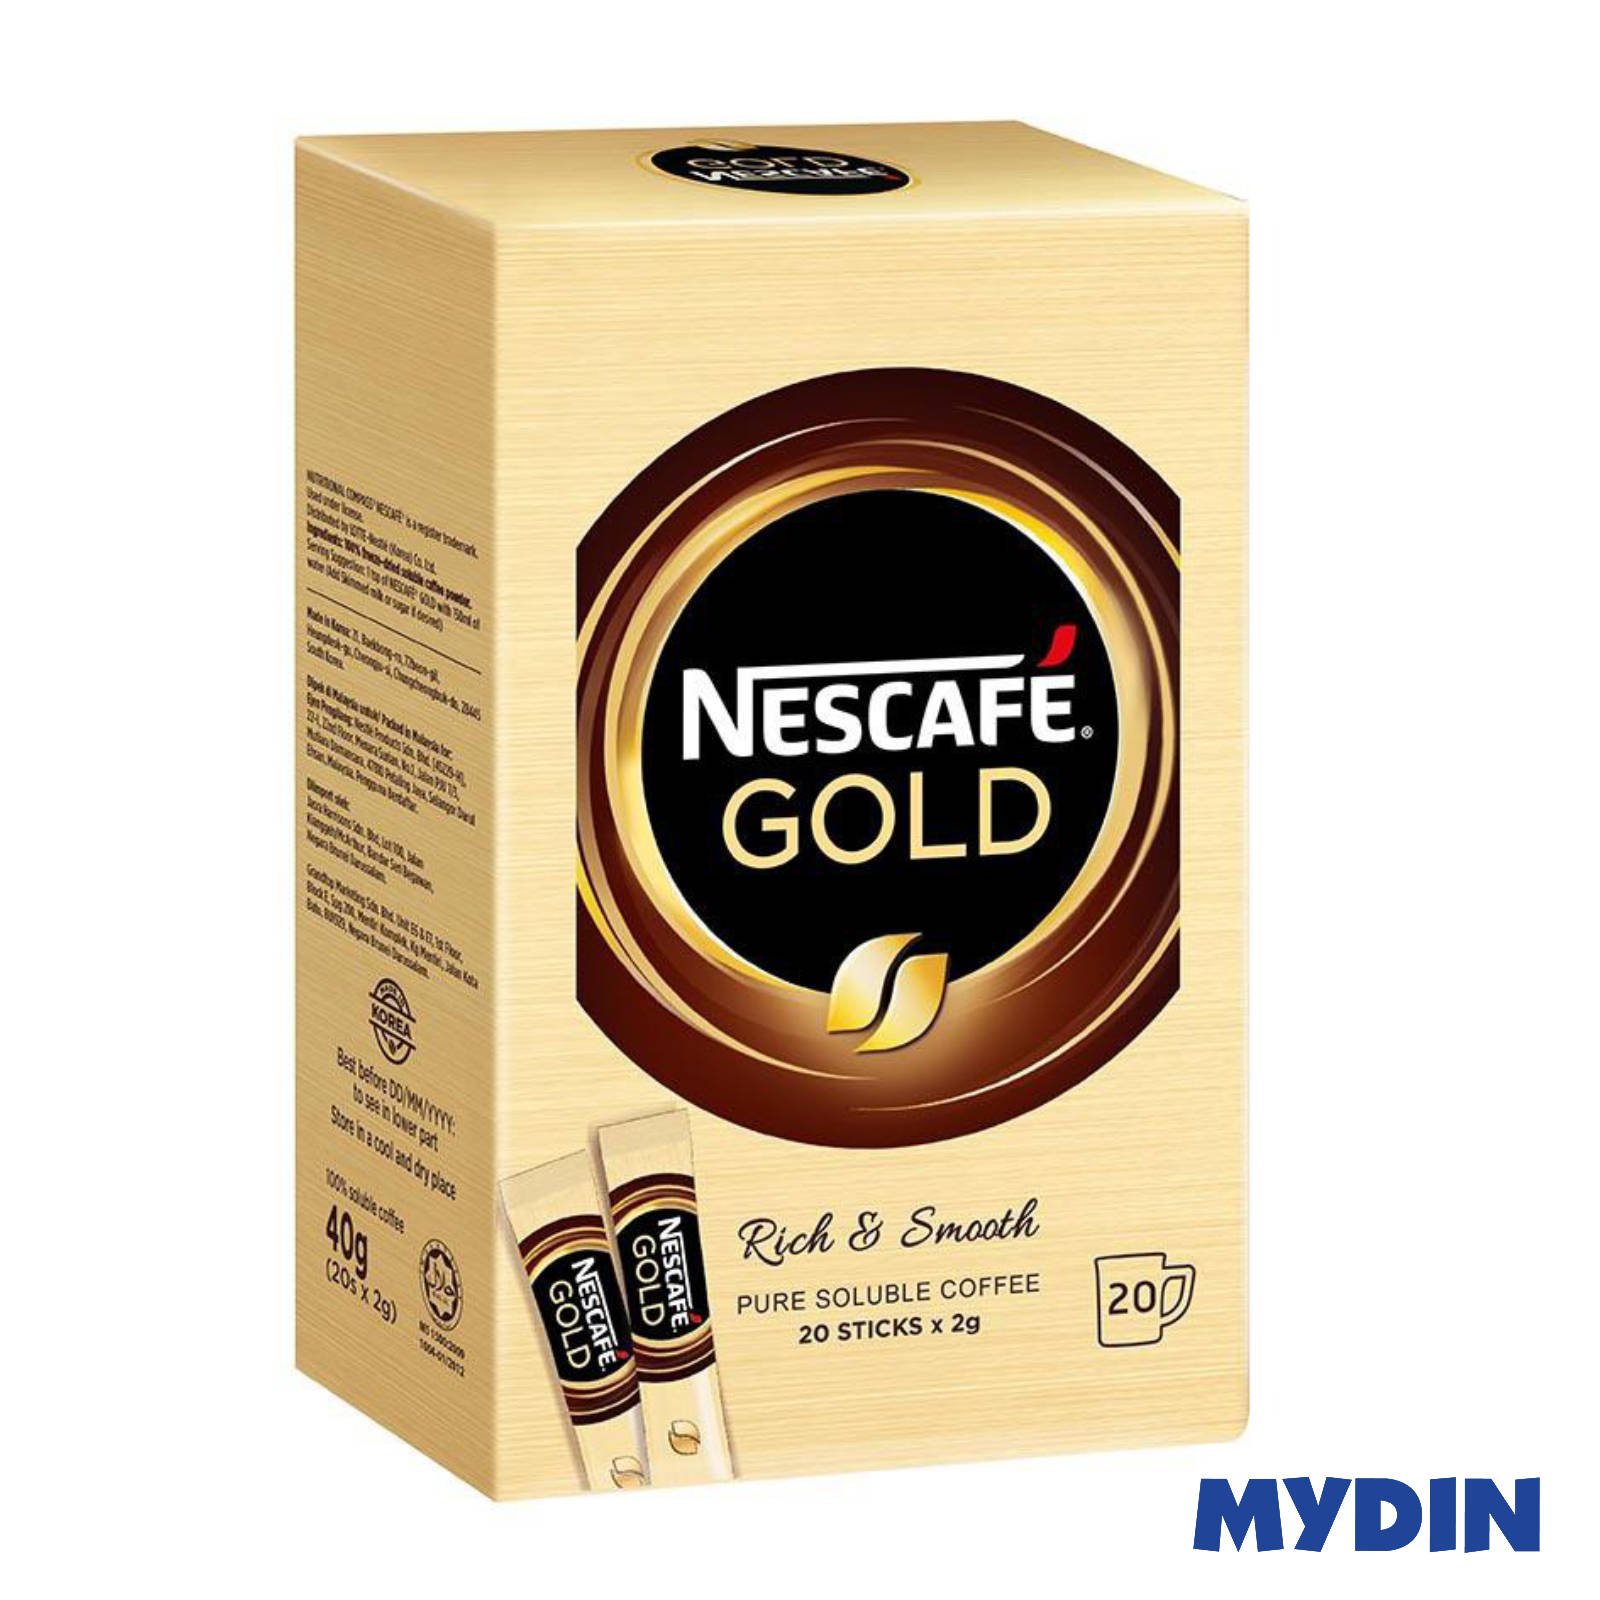 Nescafe Gold Rich & Smooth (20 x 2g)